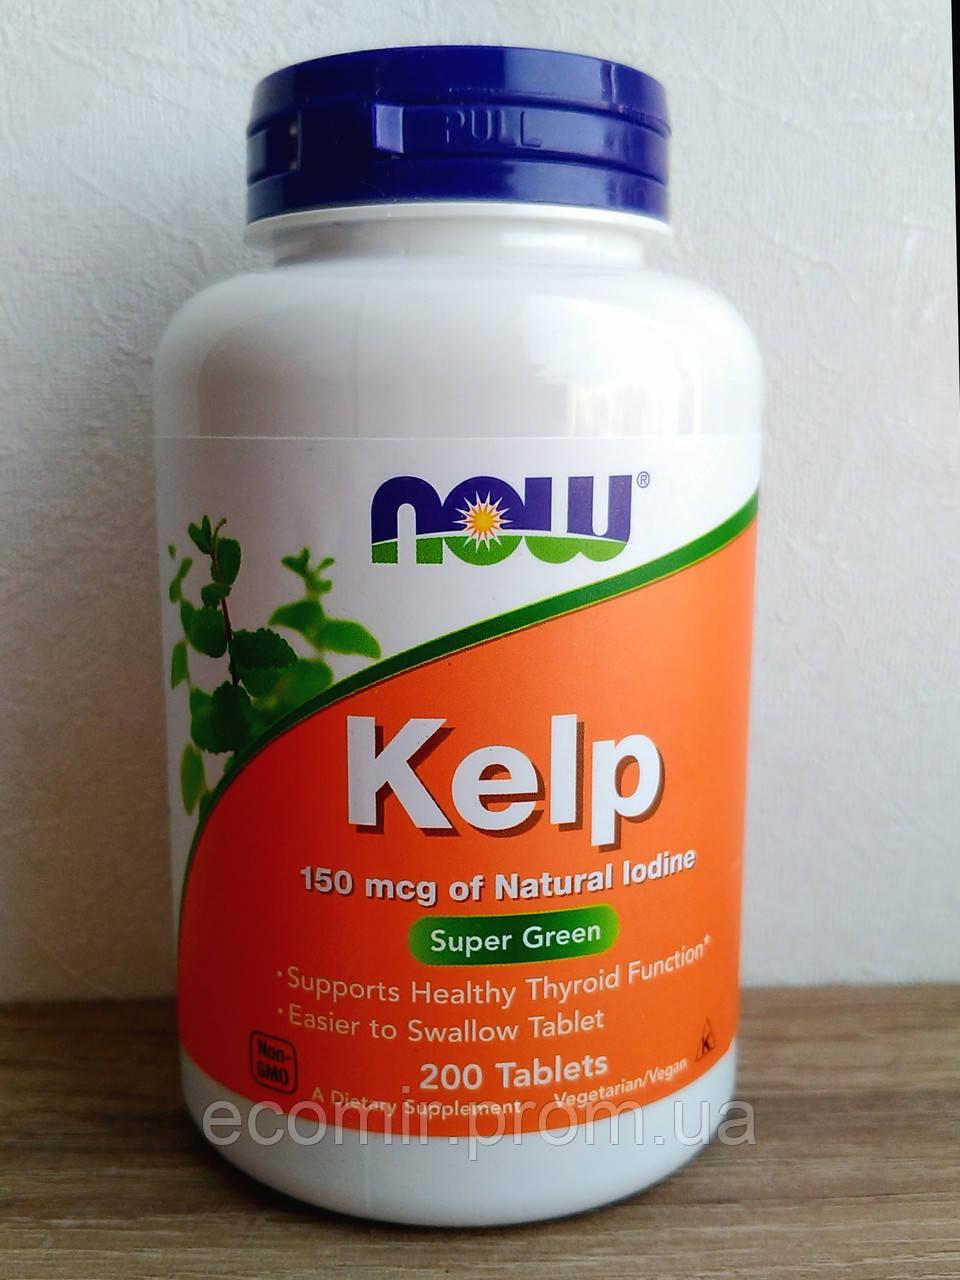 Ламинария (Бурая водоросль), Now Foods (200 таблеток)